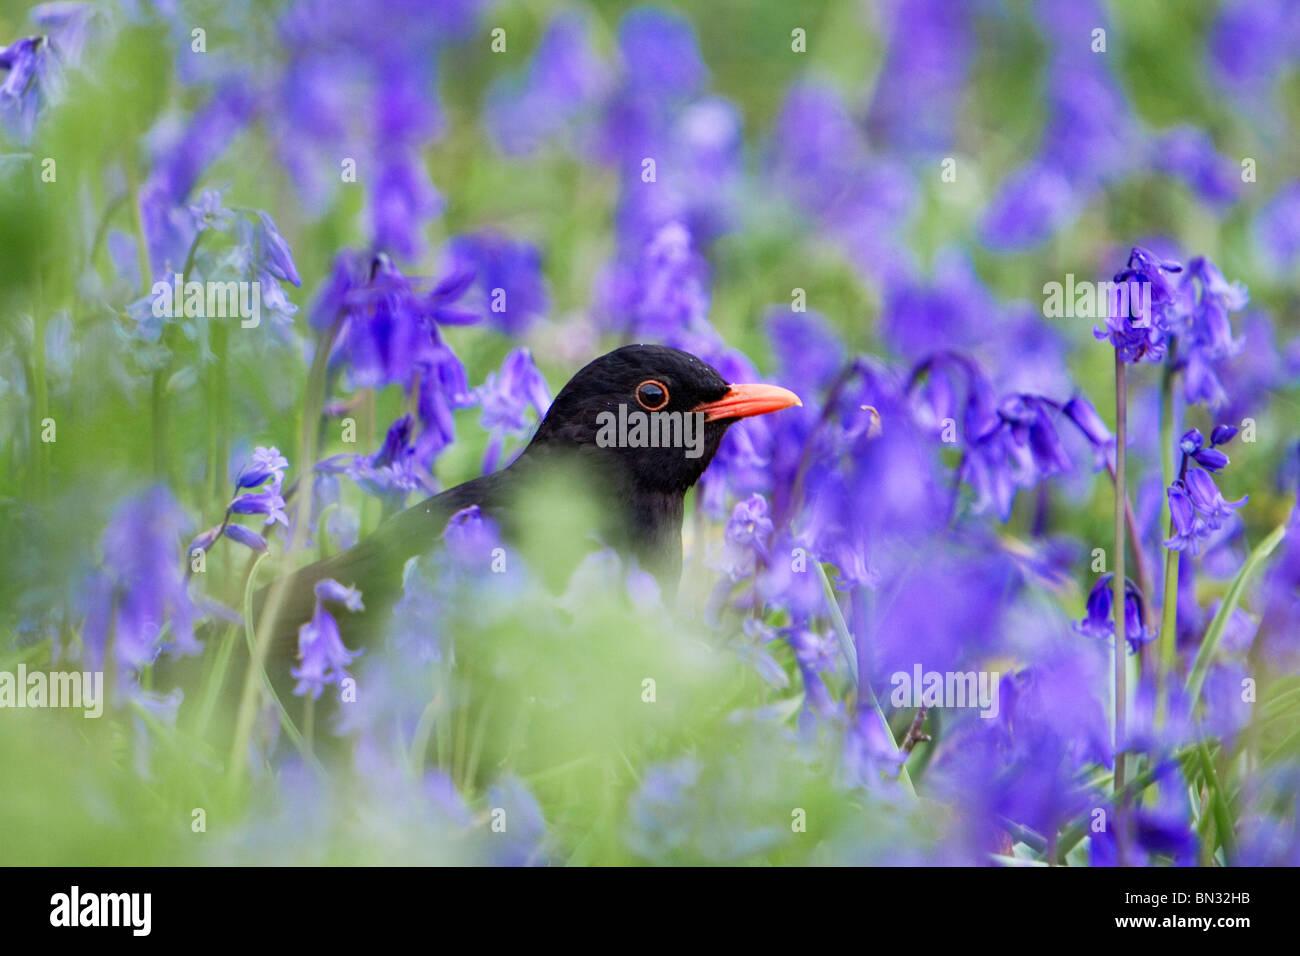 Blackbird; Turdus merula; male; amongst bluebells - Stock Image